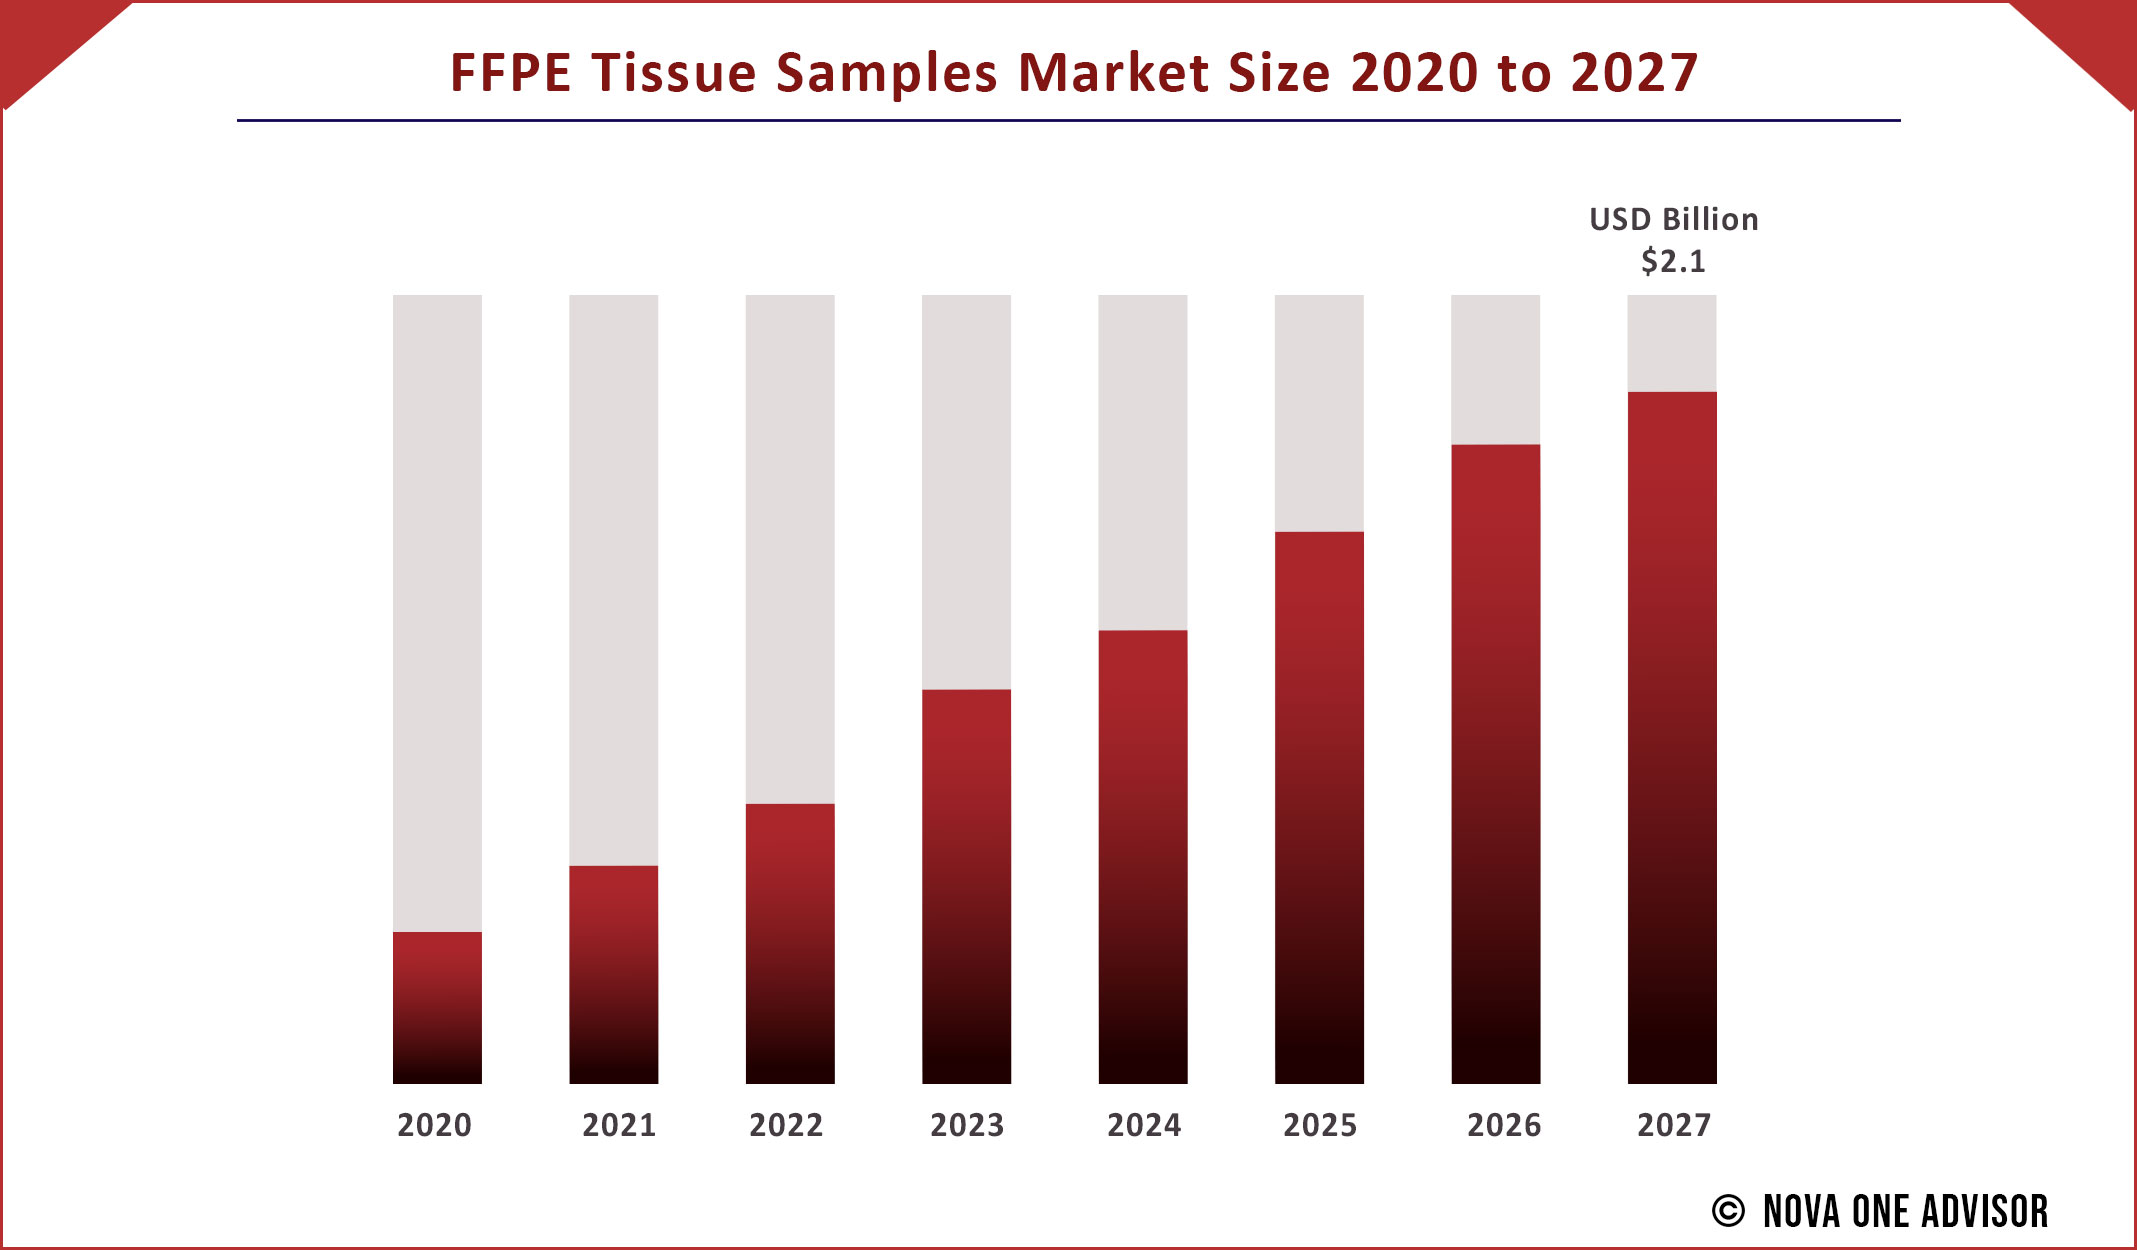 FFPE Tissue Samples Market Size 2020 to 2027